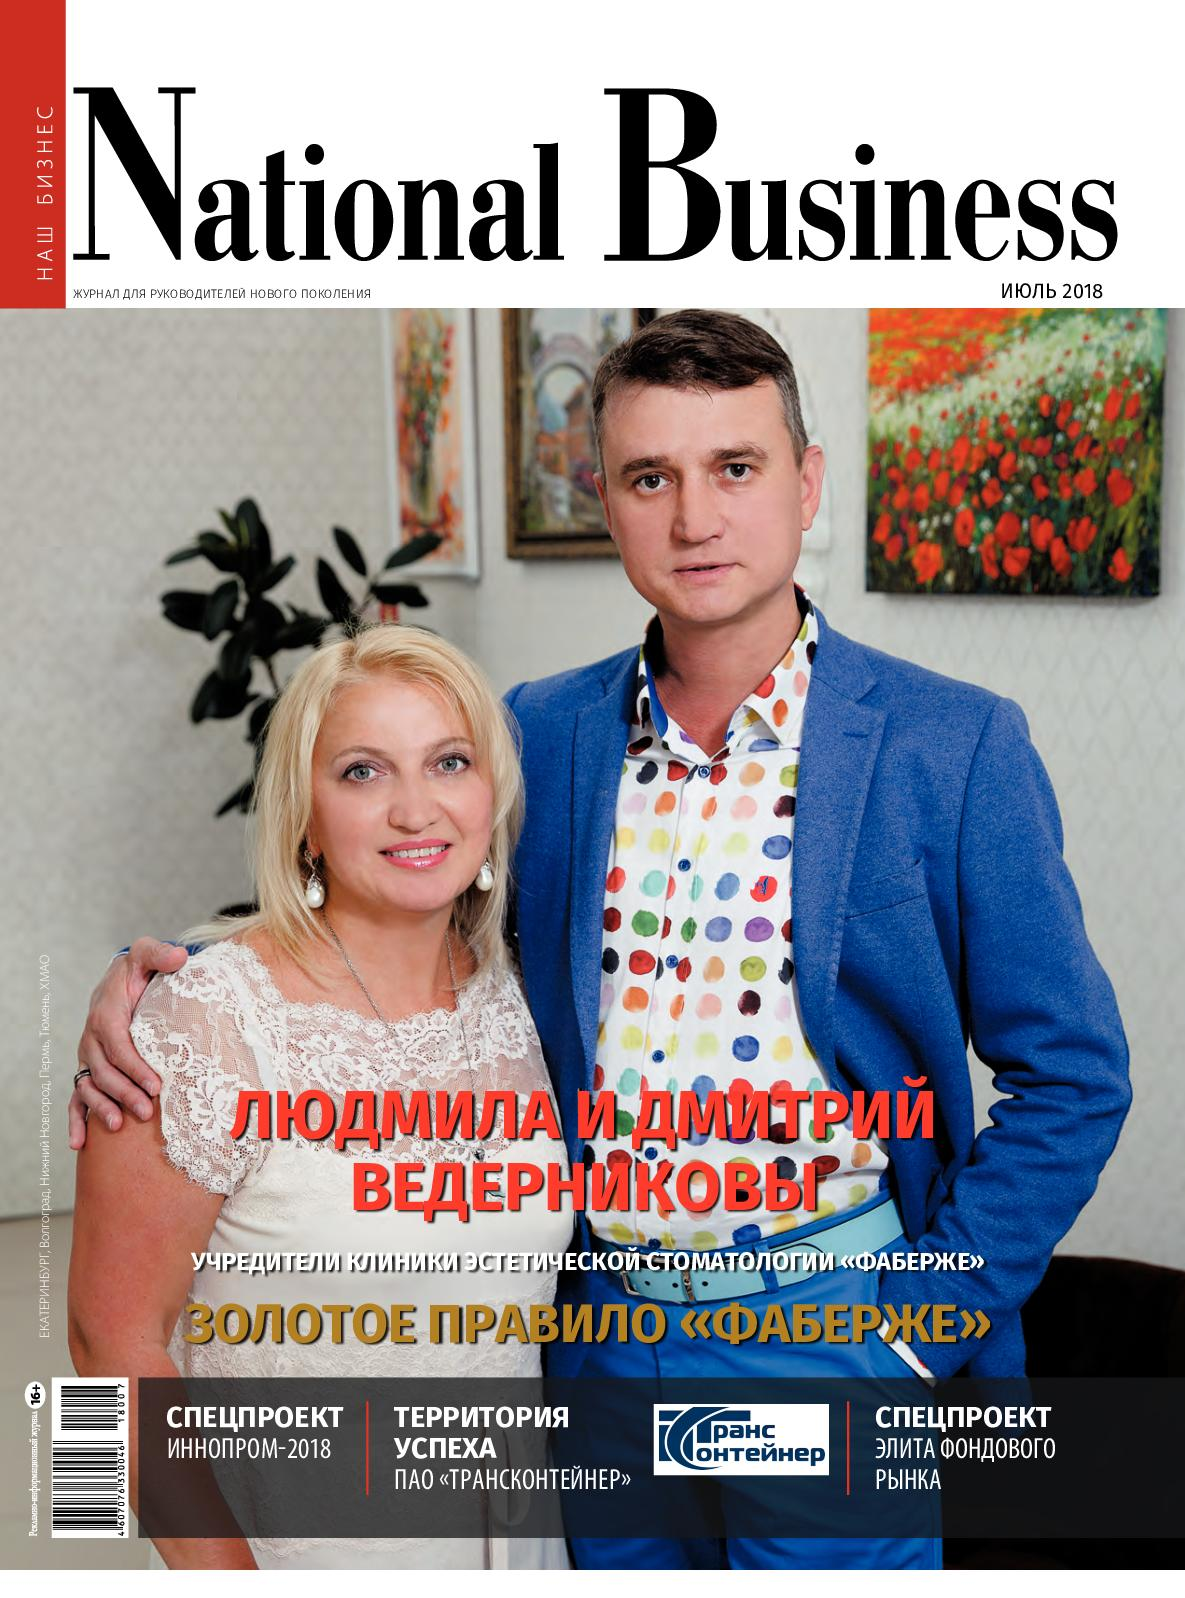 Calaméo - National Business Екатеринбург июль 2018 f208299b70c